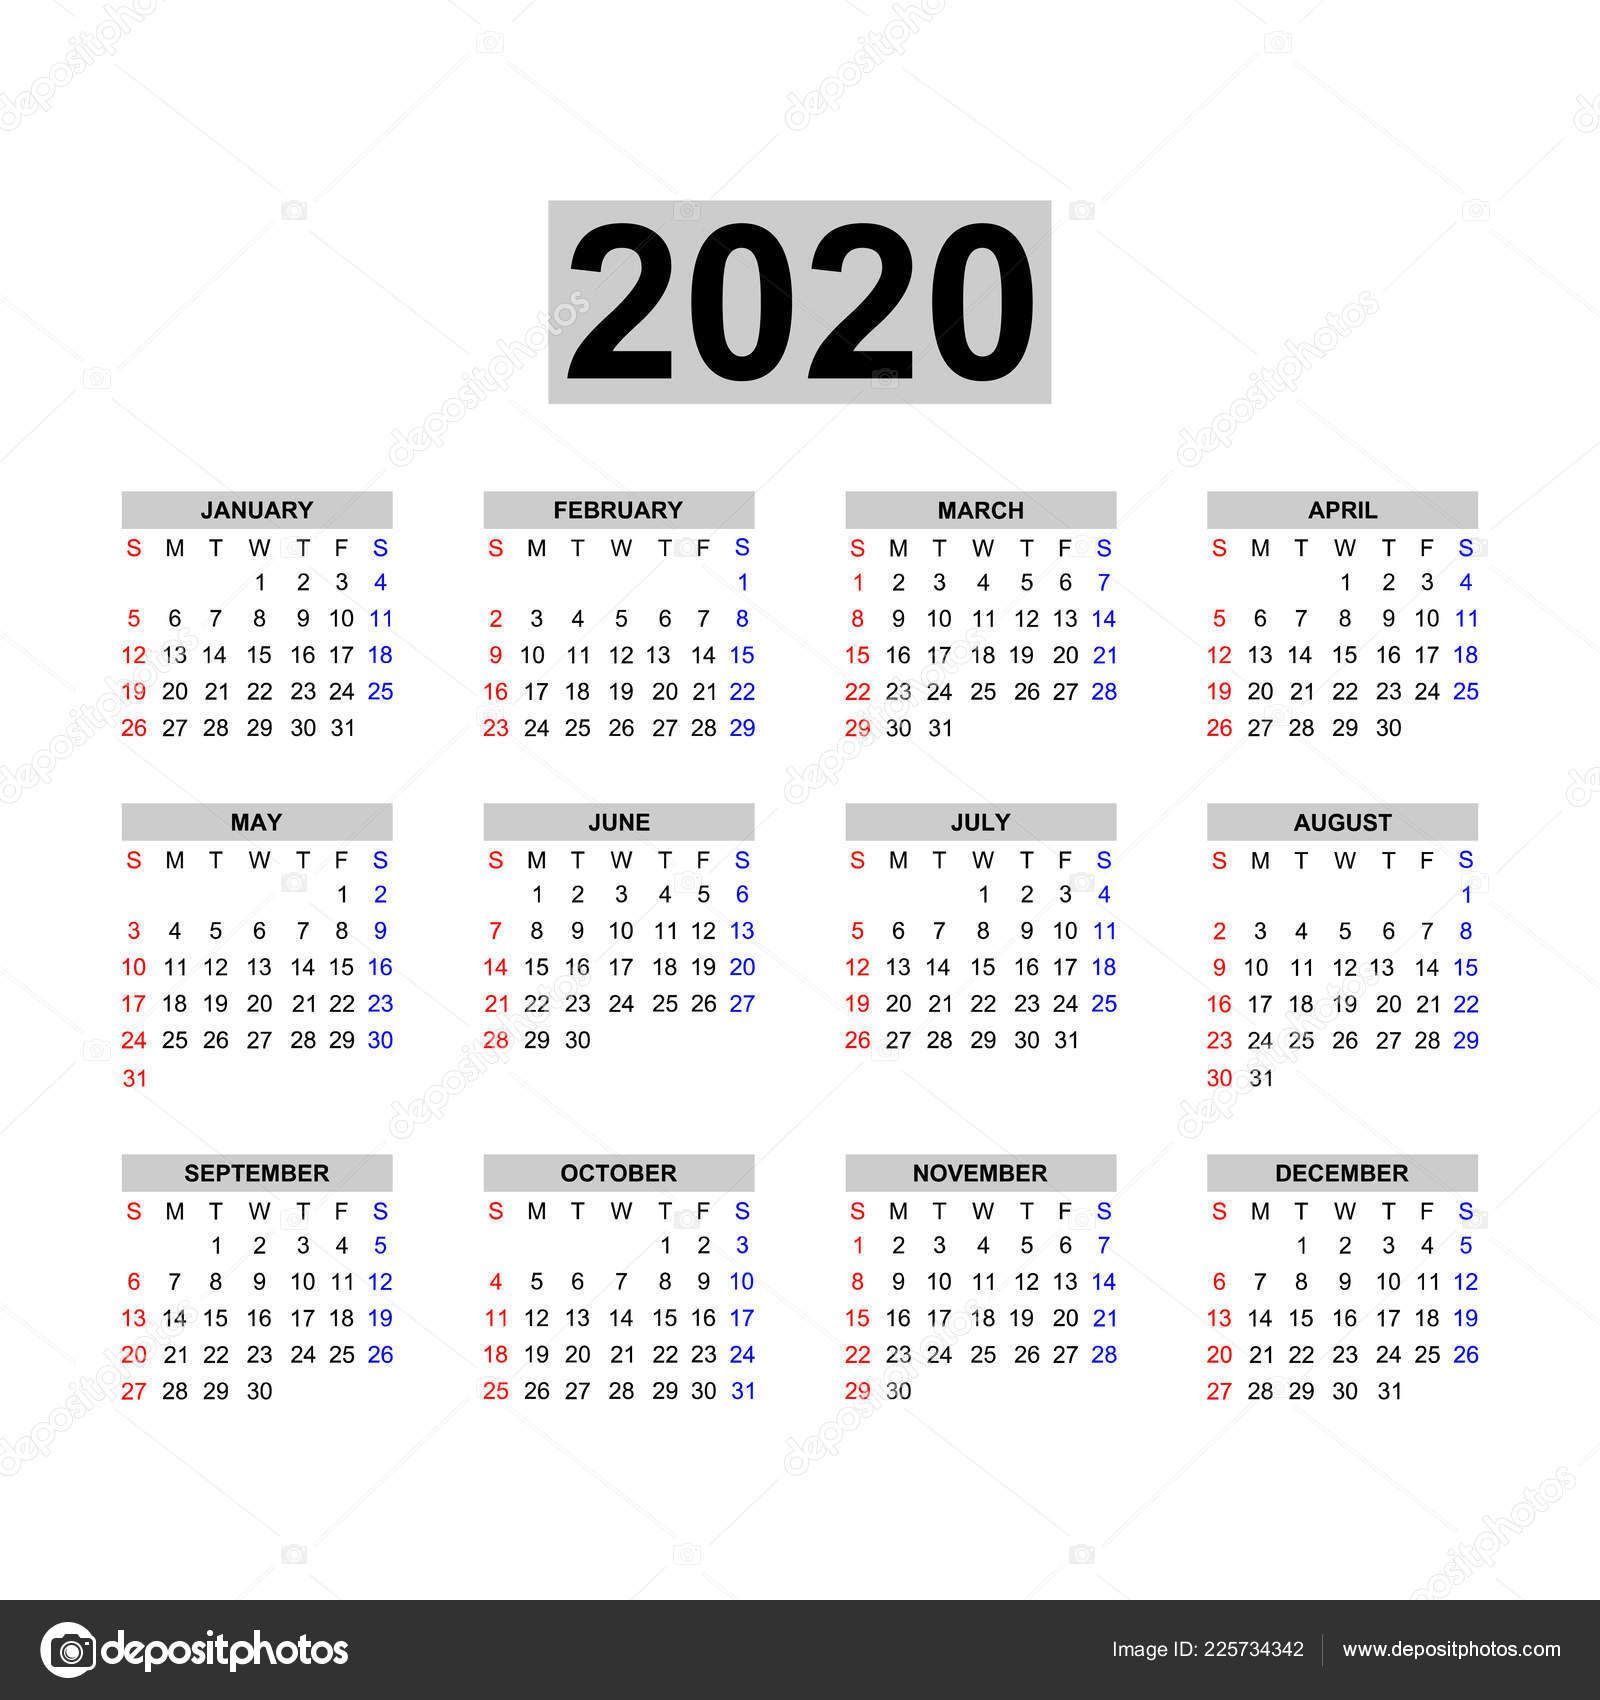 Calendario 2020 Portugues Com Feriados.Modelo Calendario 2020 Calendario Design Nas Cores Preto